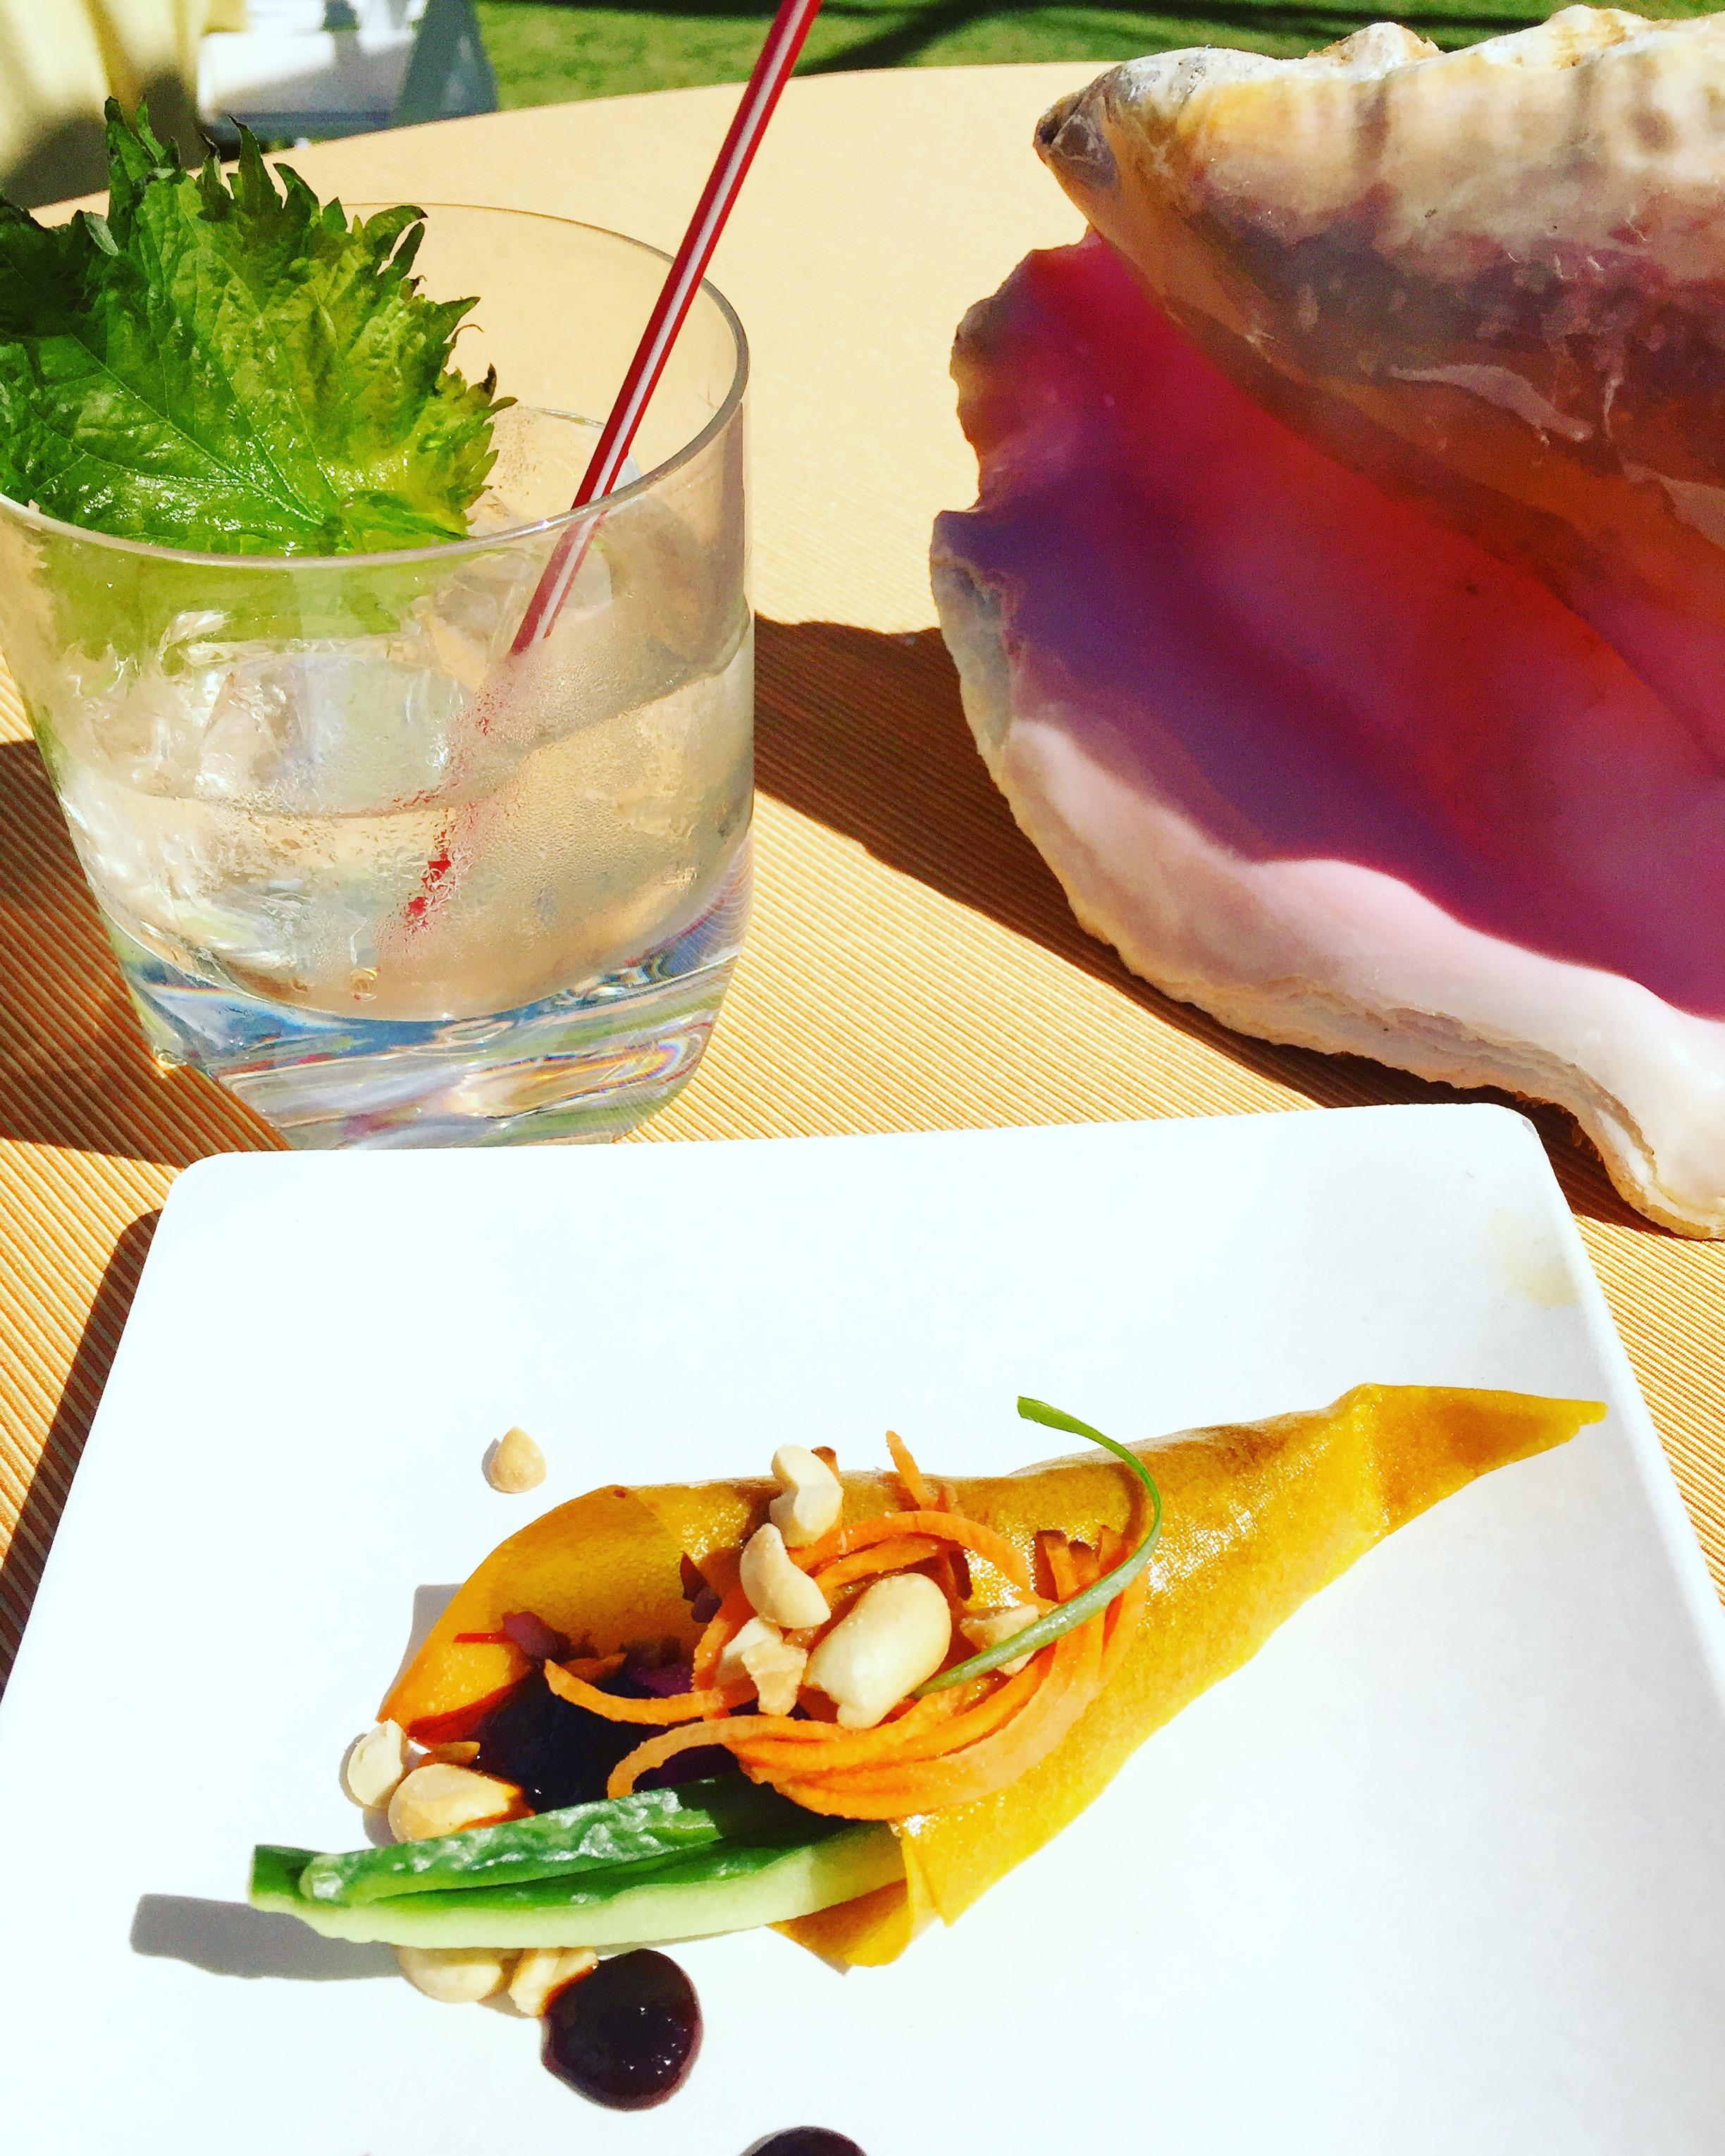 Nyamaste & Saucha's Malaysian inspired coconut kimchi cone with spicy mange peanut glaze